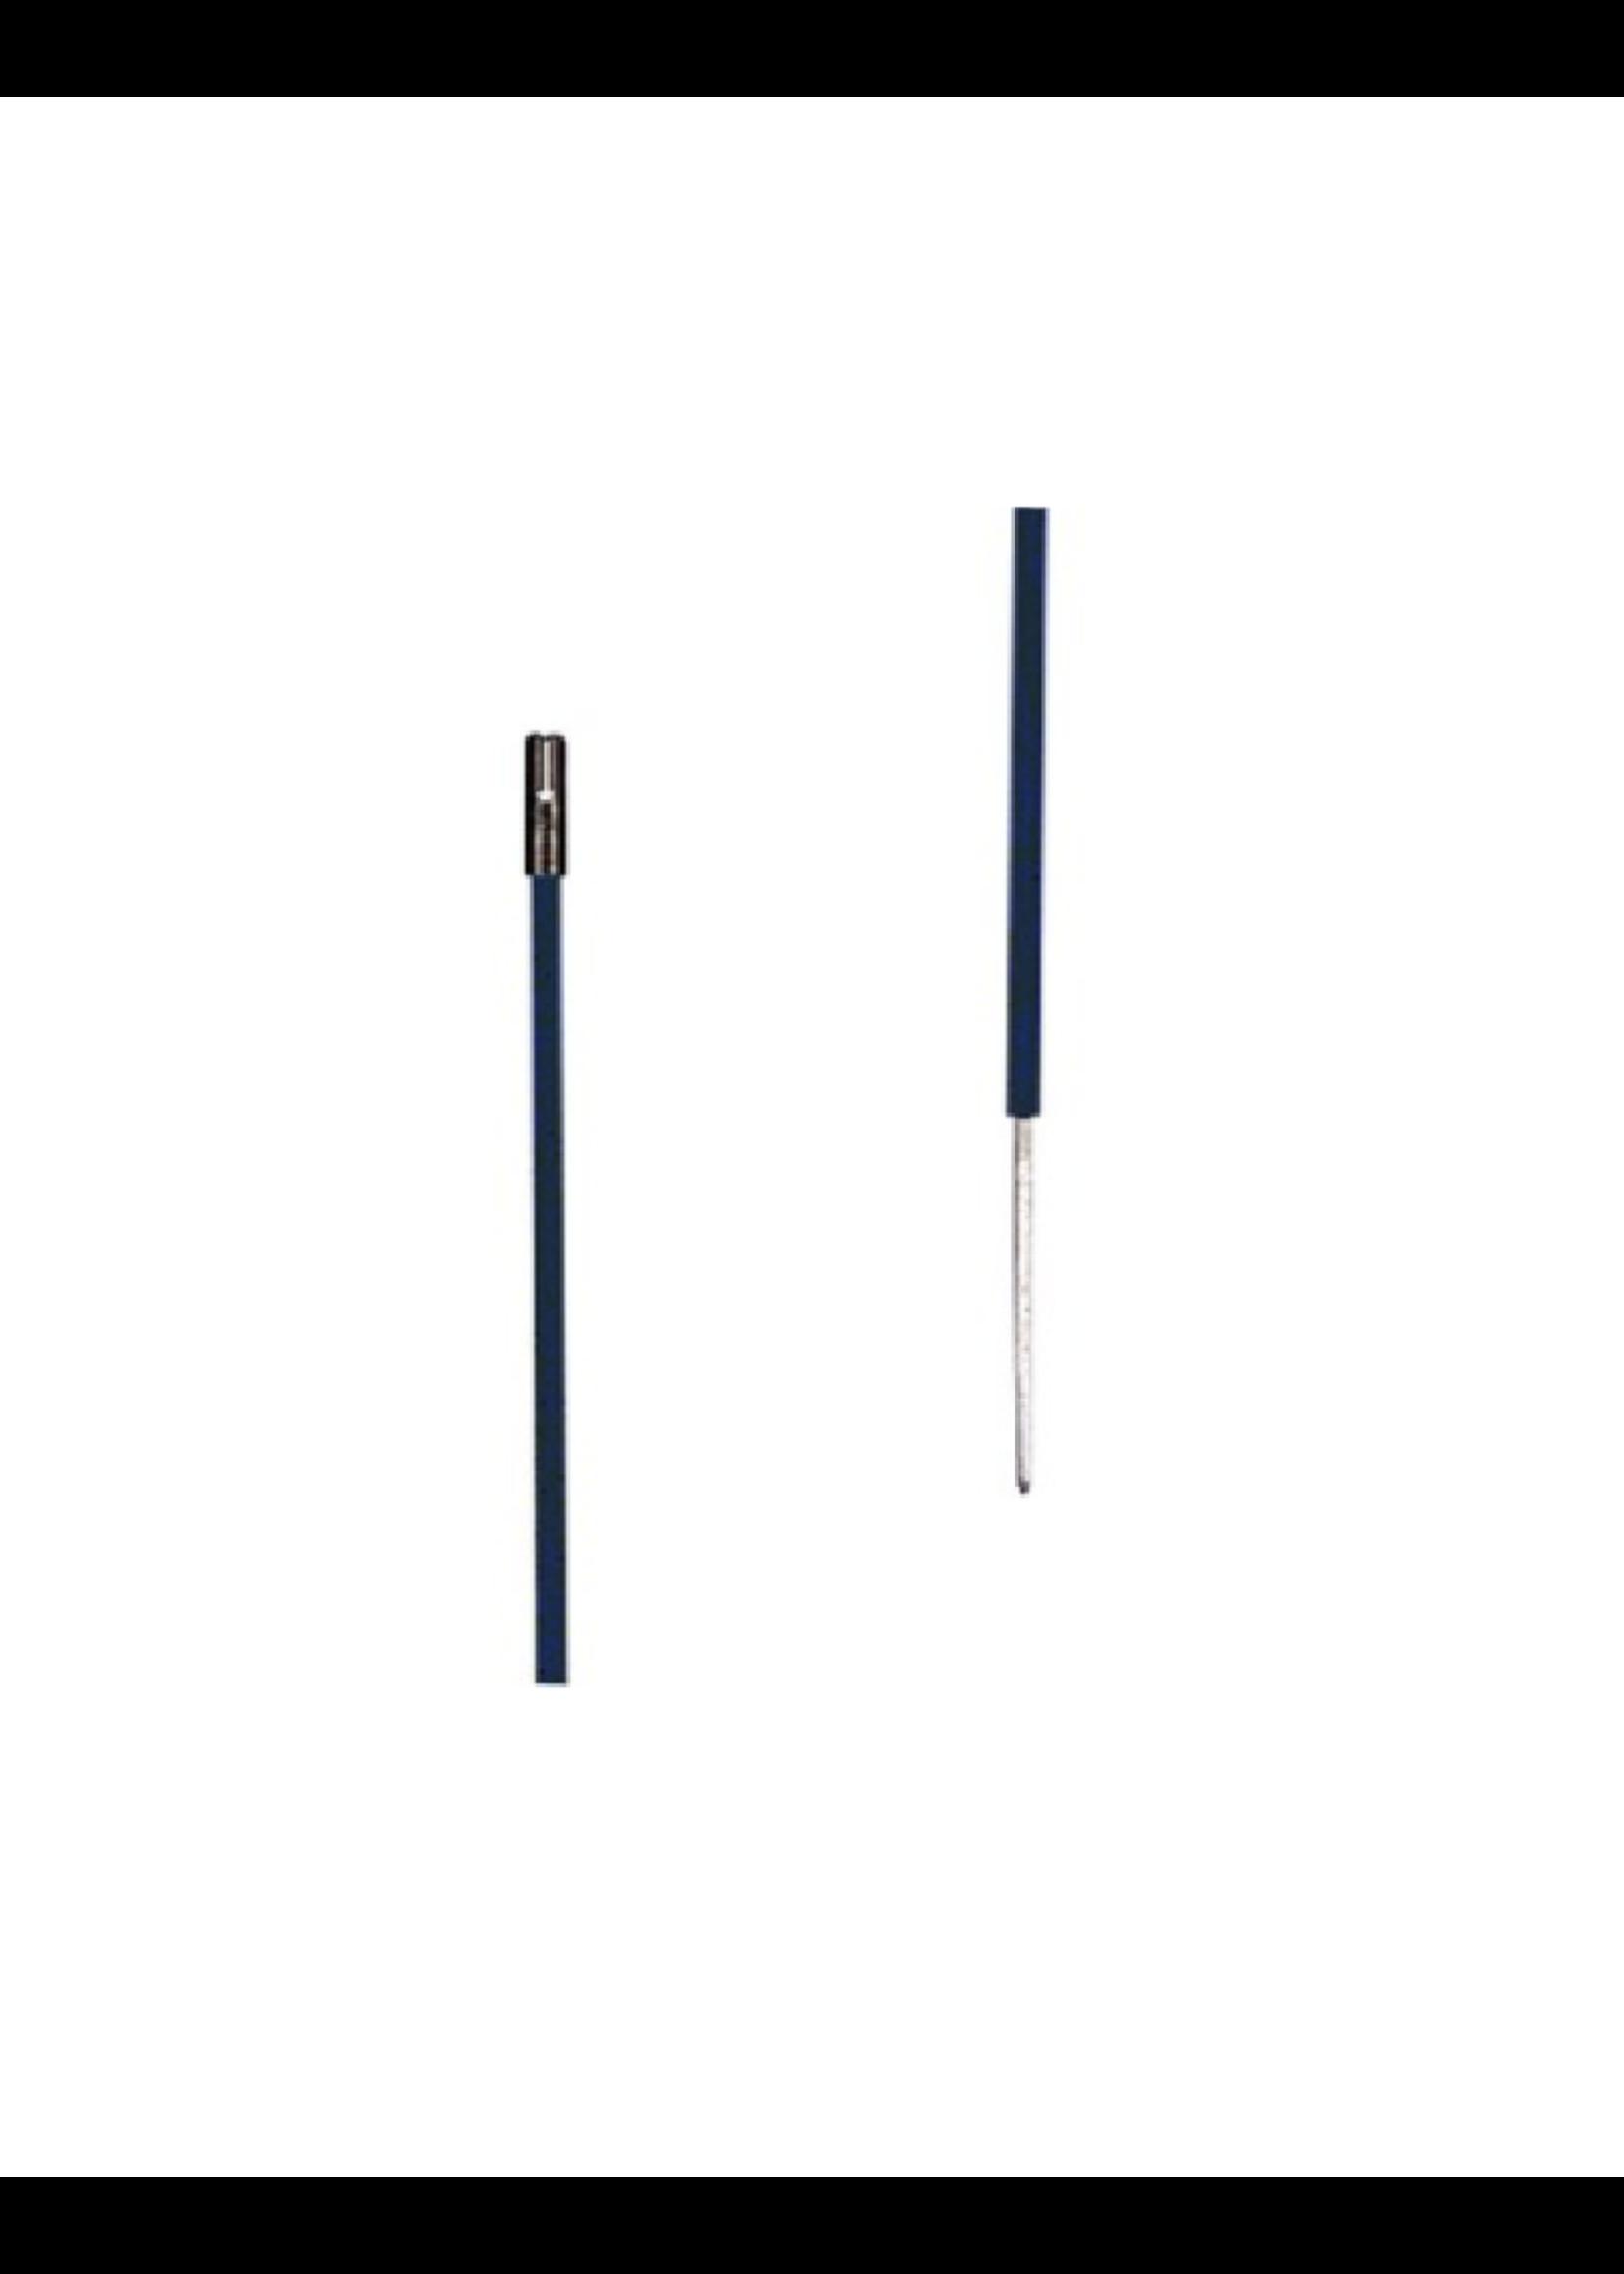 Gallagher Gallagher Kunststof paal zwart, 0,50m + 0,20m pen (10 stuks)